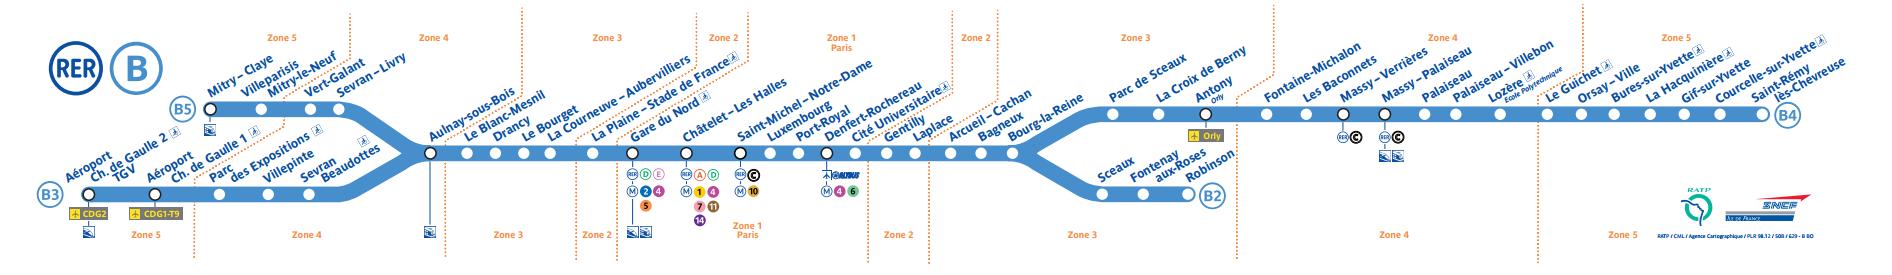 Карта станций ветки B